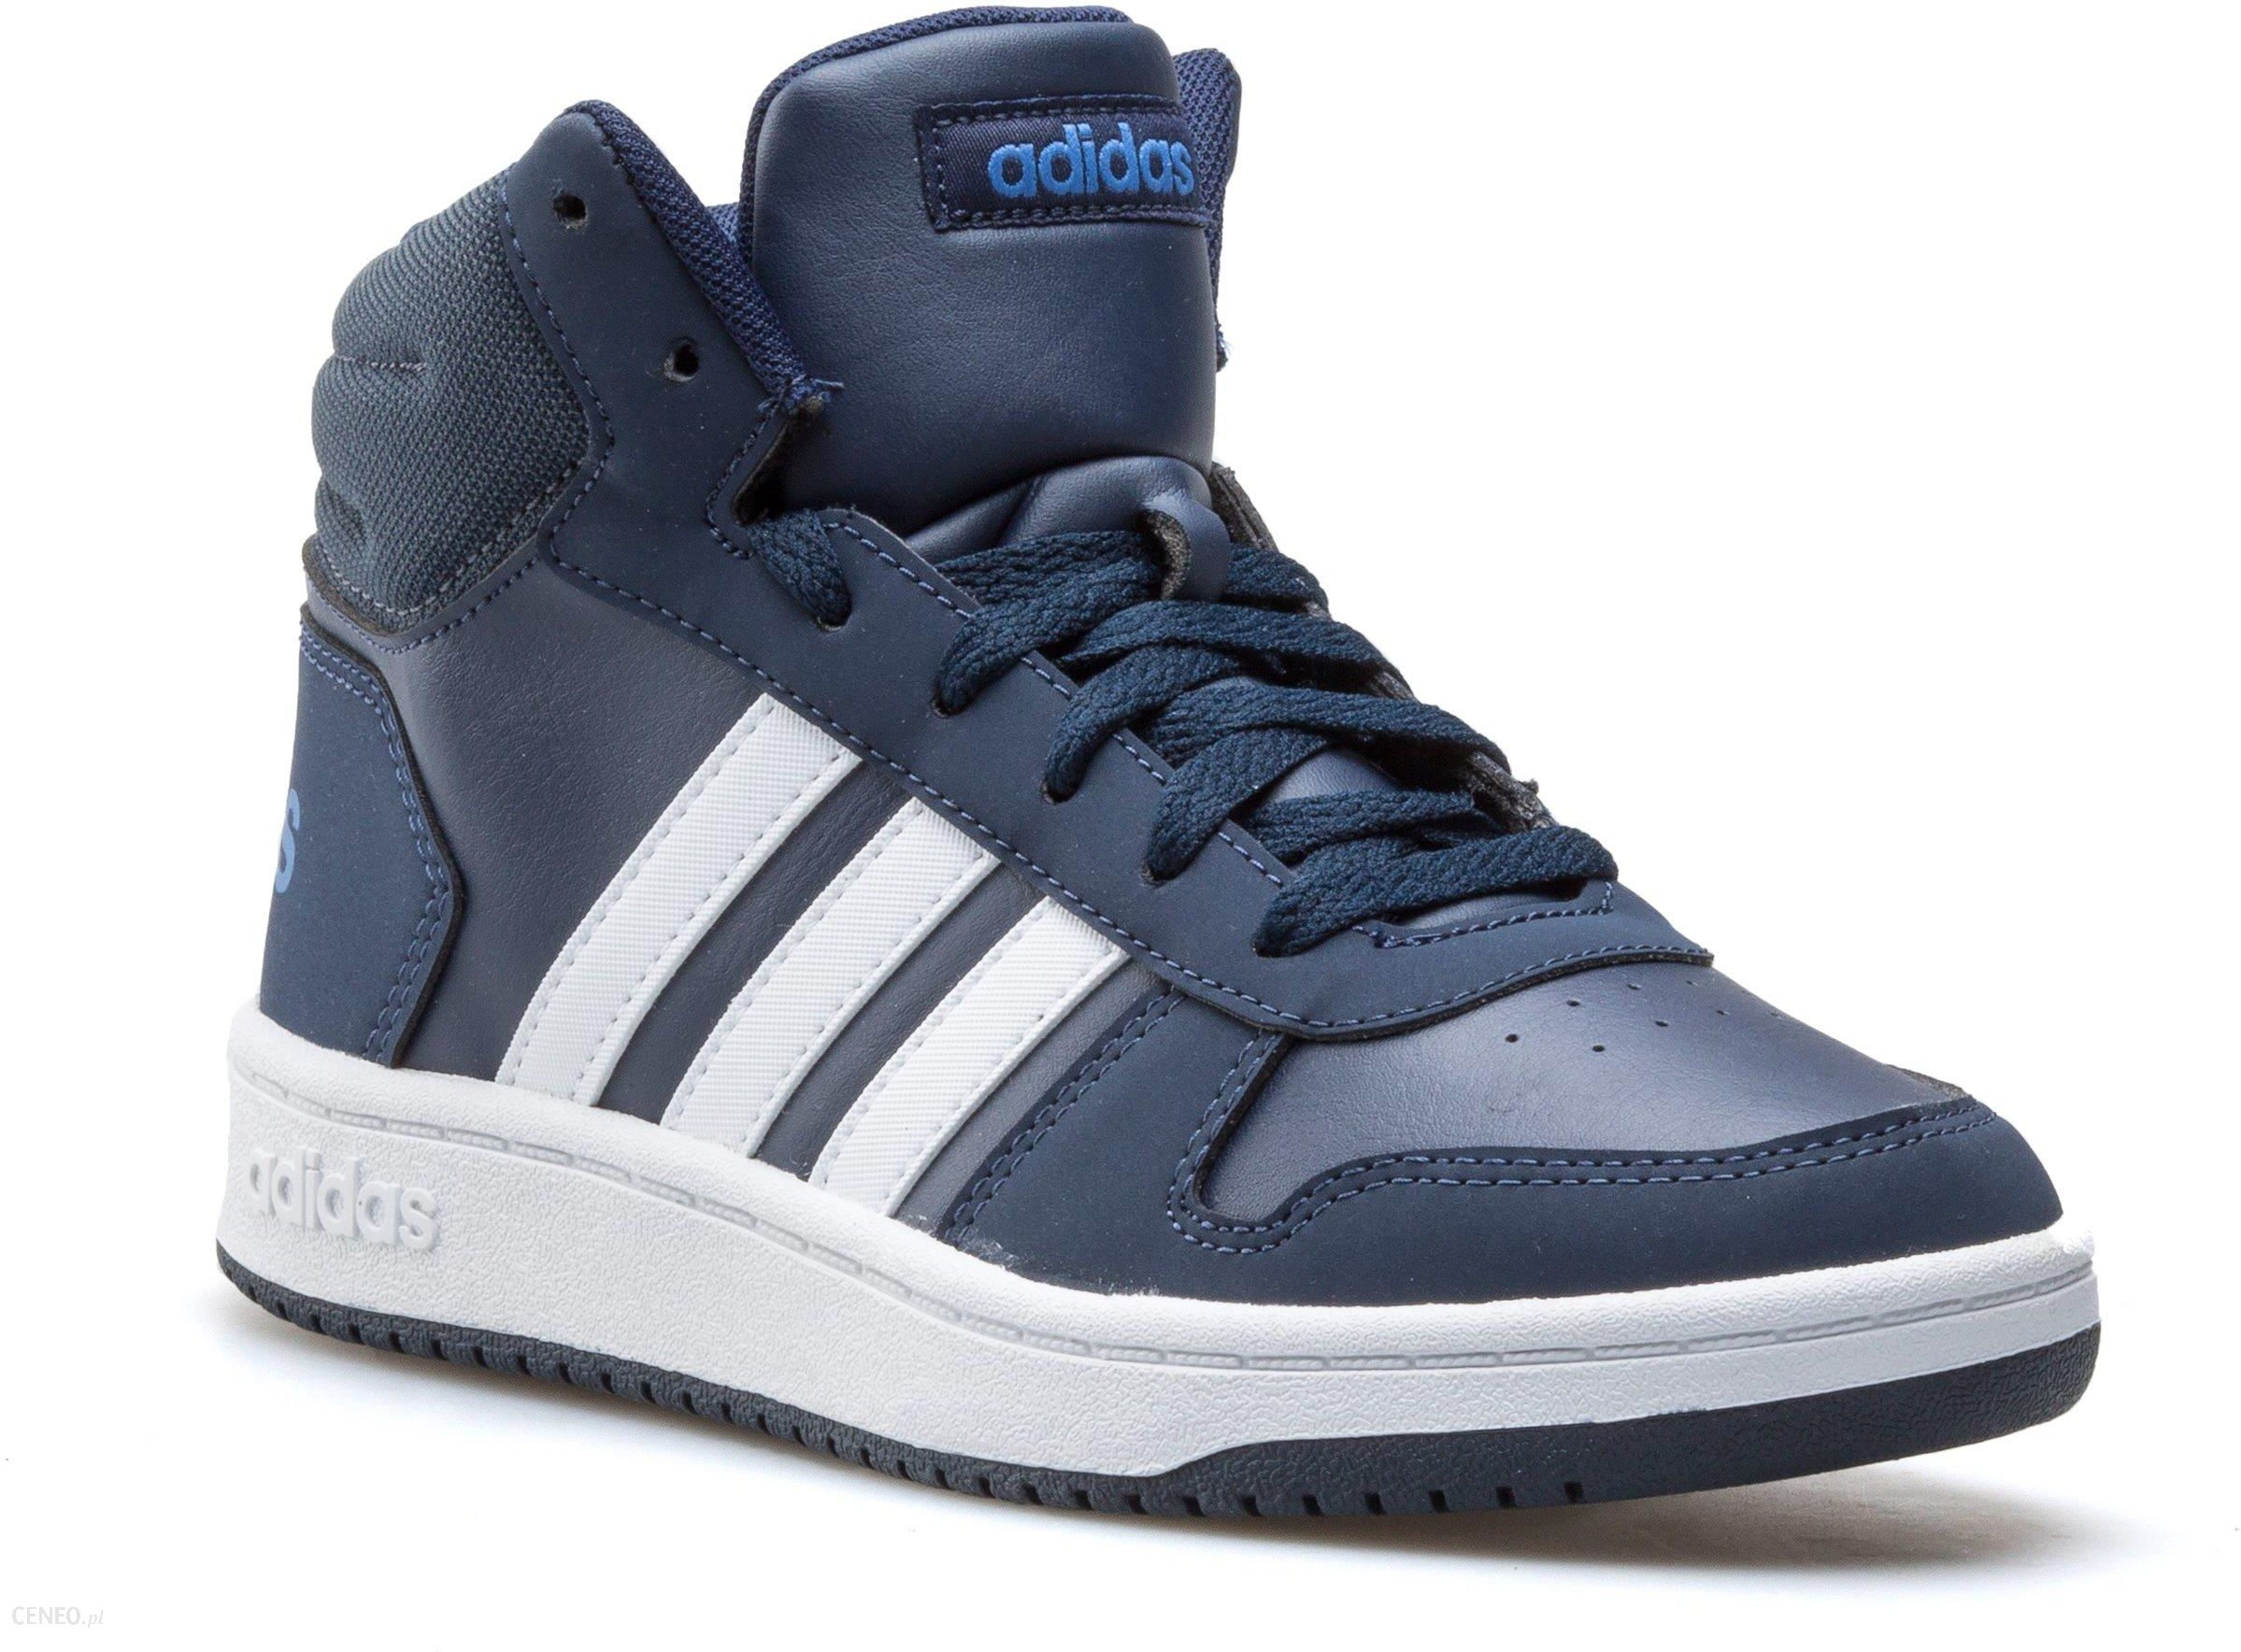 Adidas Buty Sportowe Damskie Hoops Light Mid K 38